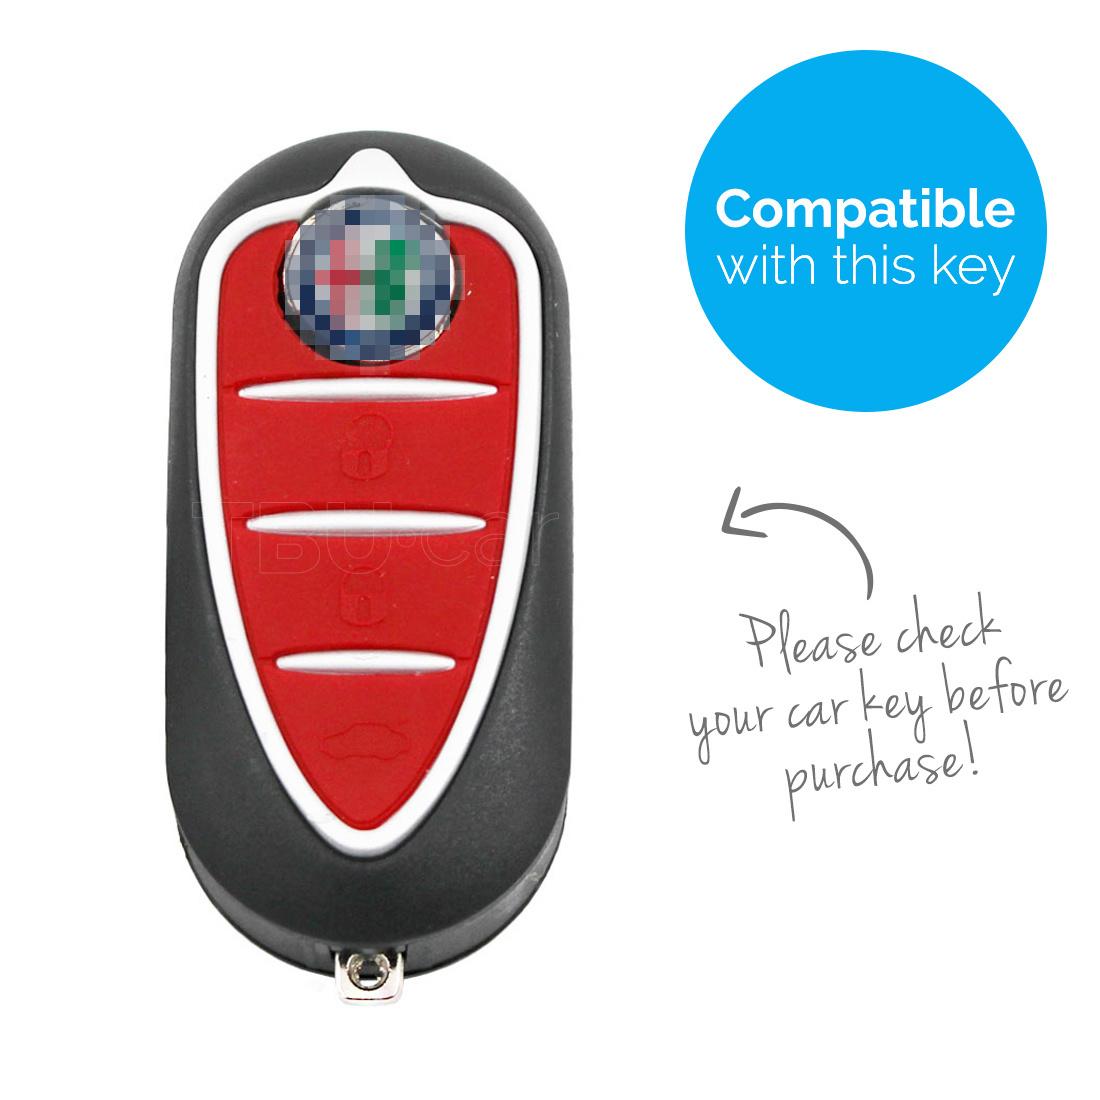 TBU car TBU car Sleutel cover compatibel met Alfa Romeo - Silicone sleutelhoesje - beschermhoesje autosleutel - Zwart